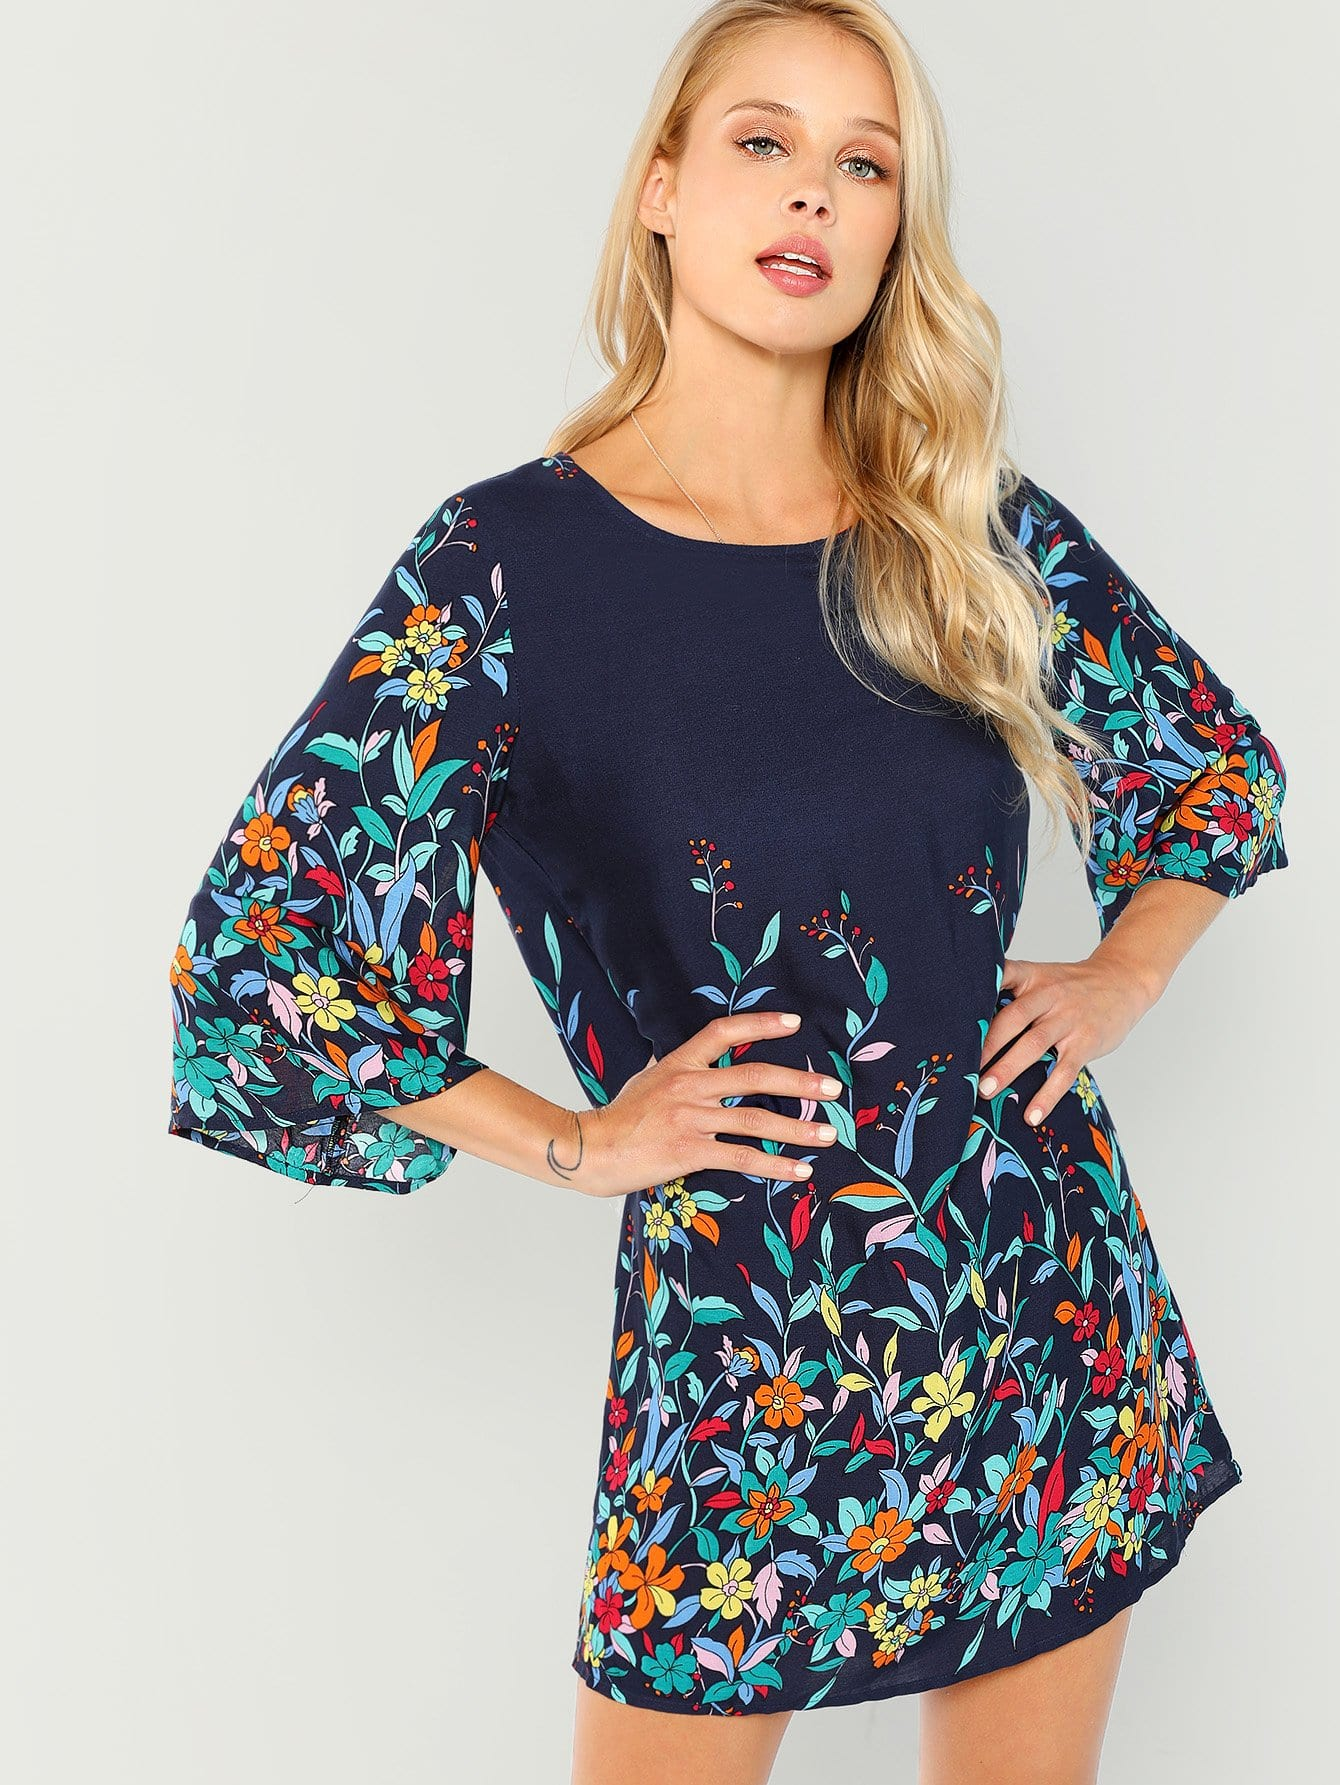 Купить Платье для печати цветов, Allie Leggett, SheIn